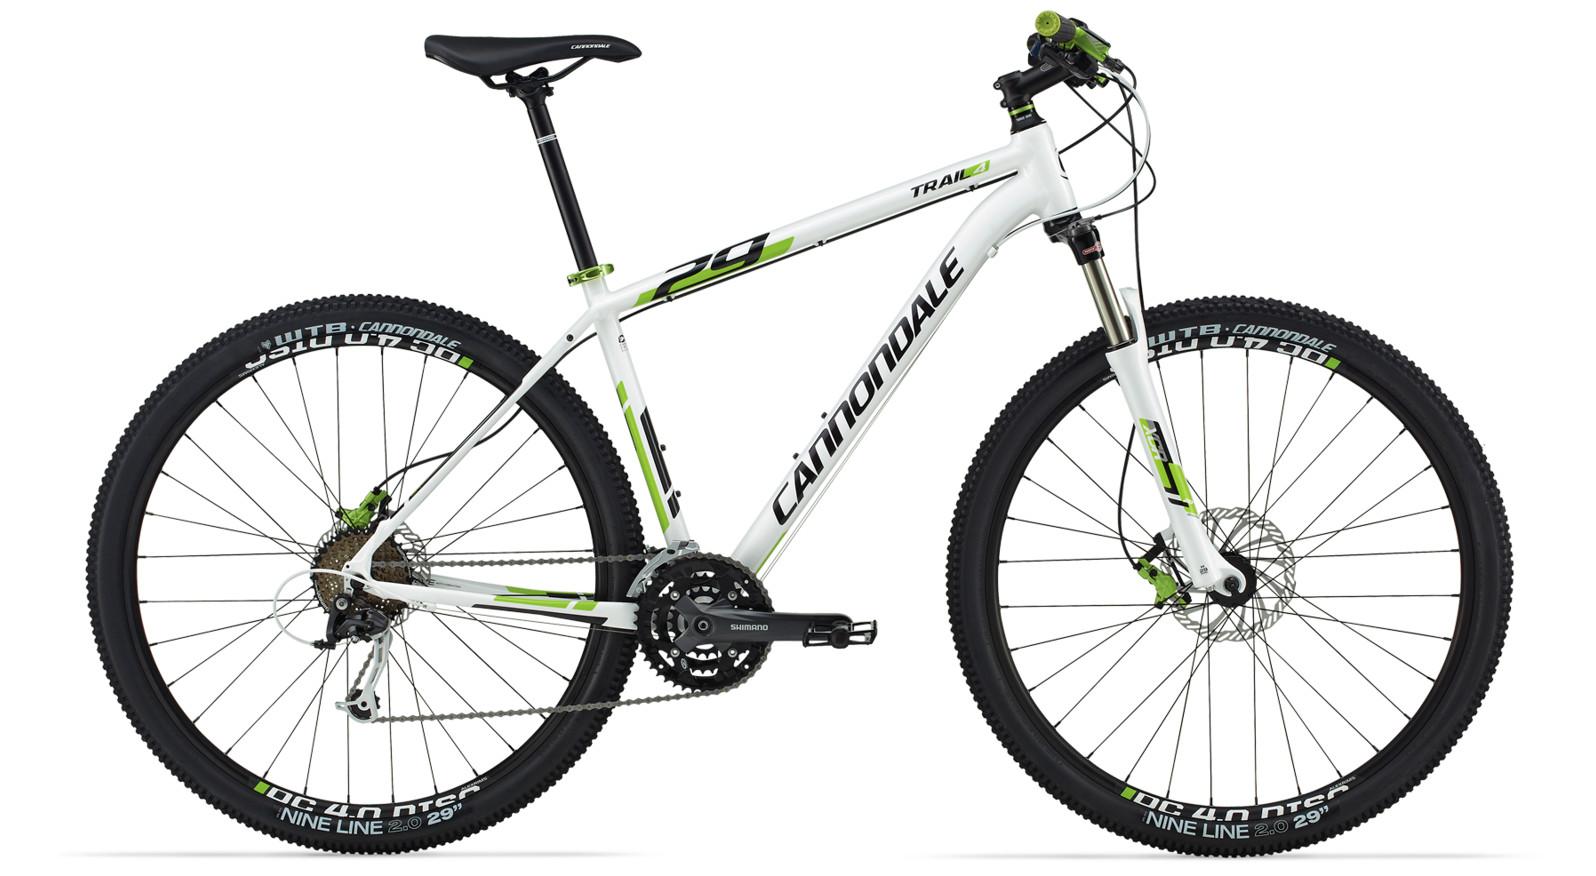 bike - 2014 Cannondale Trail 29 4 - White